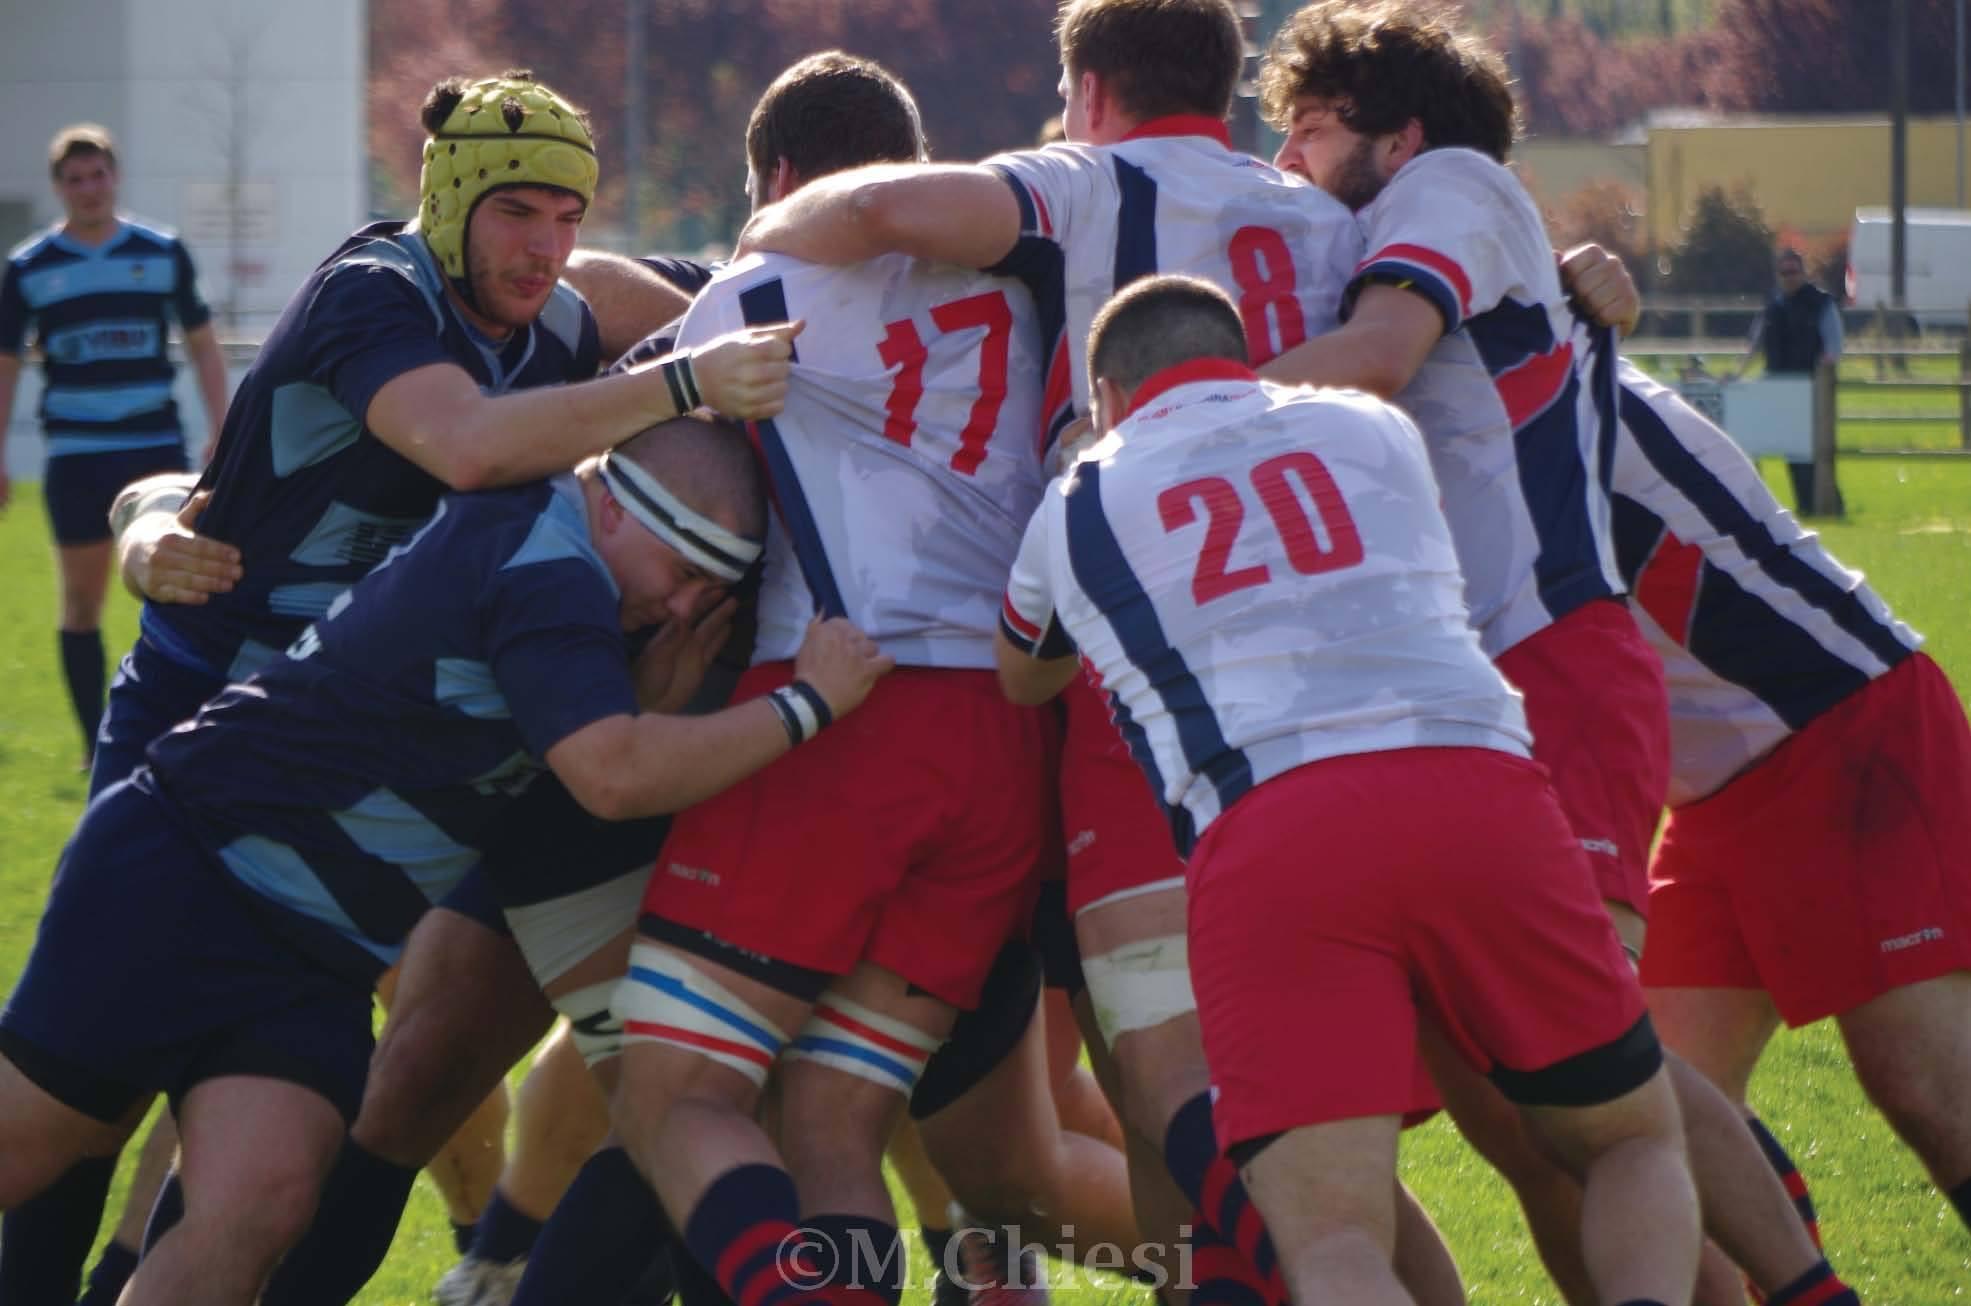 Rugby - Amatori Parma v. Bologna Rugby 1928 18-17 - 27 Mar